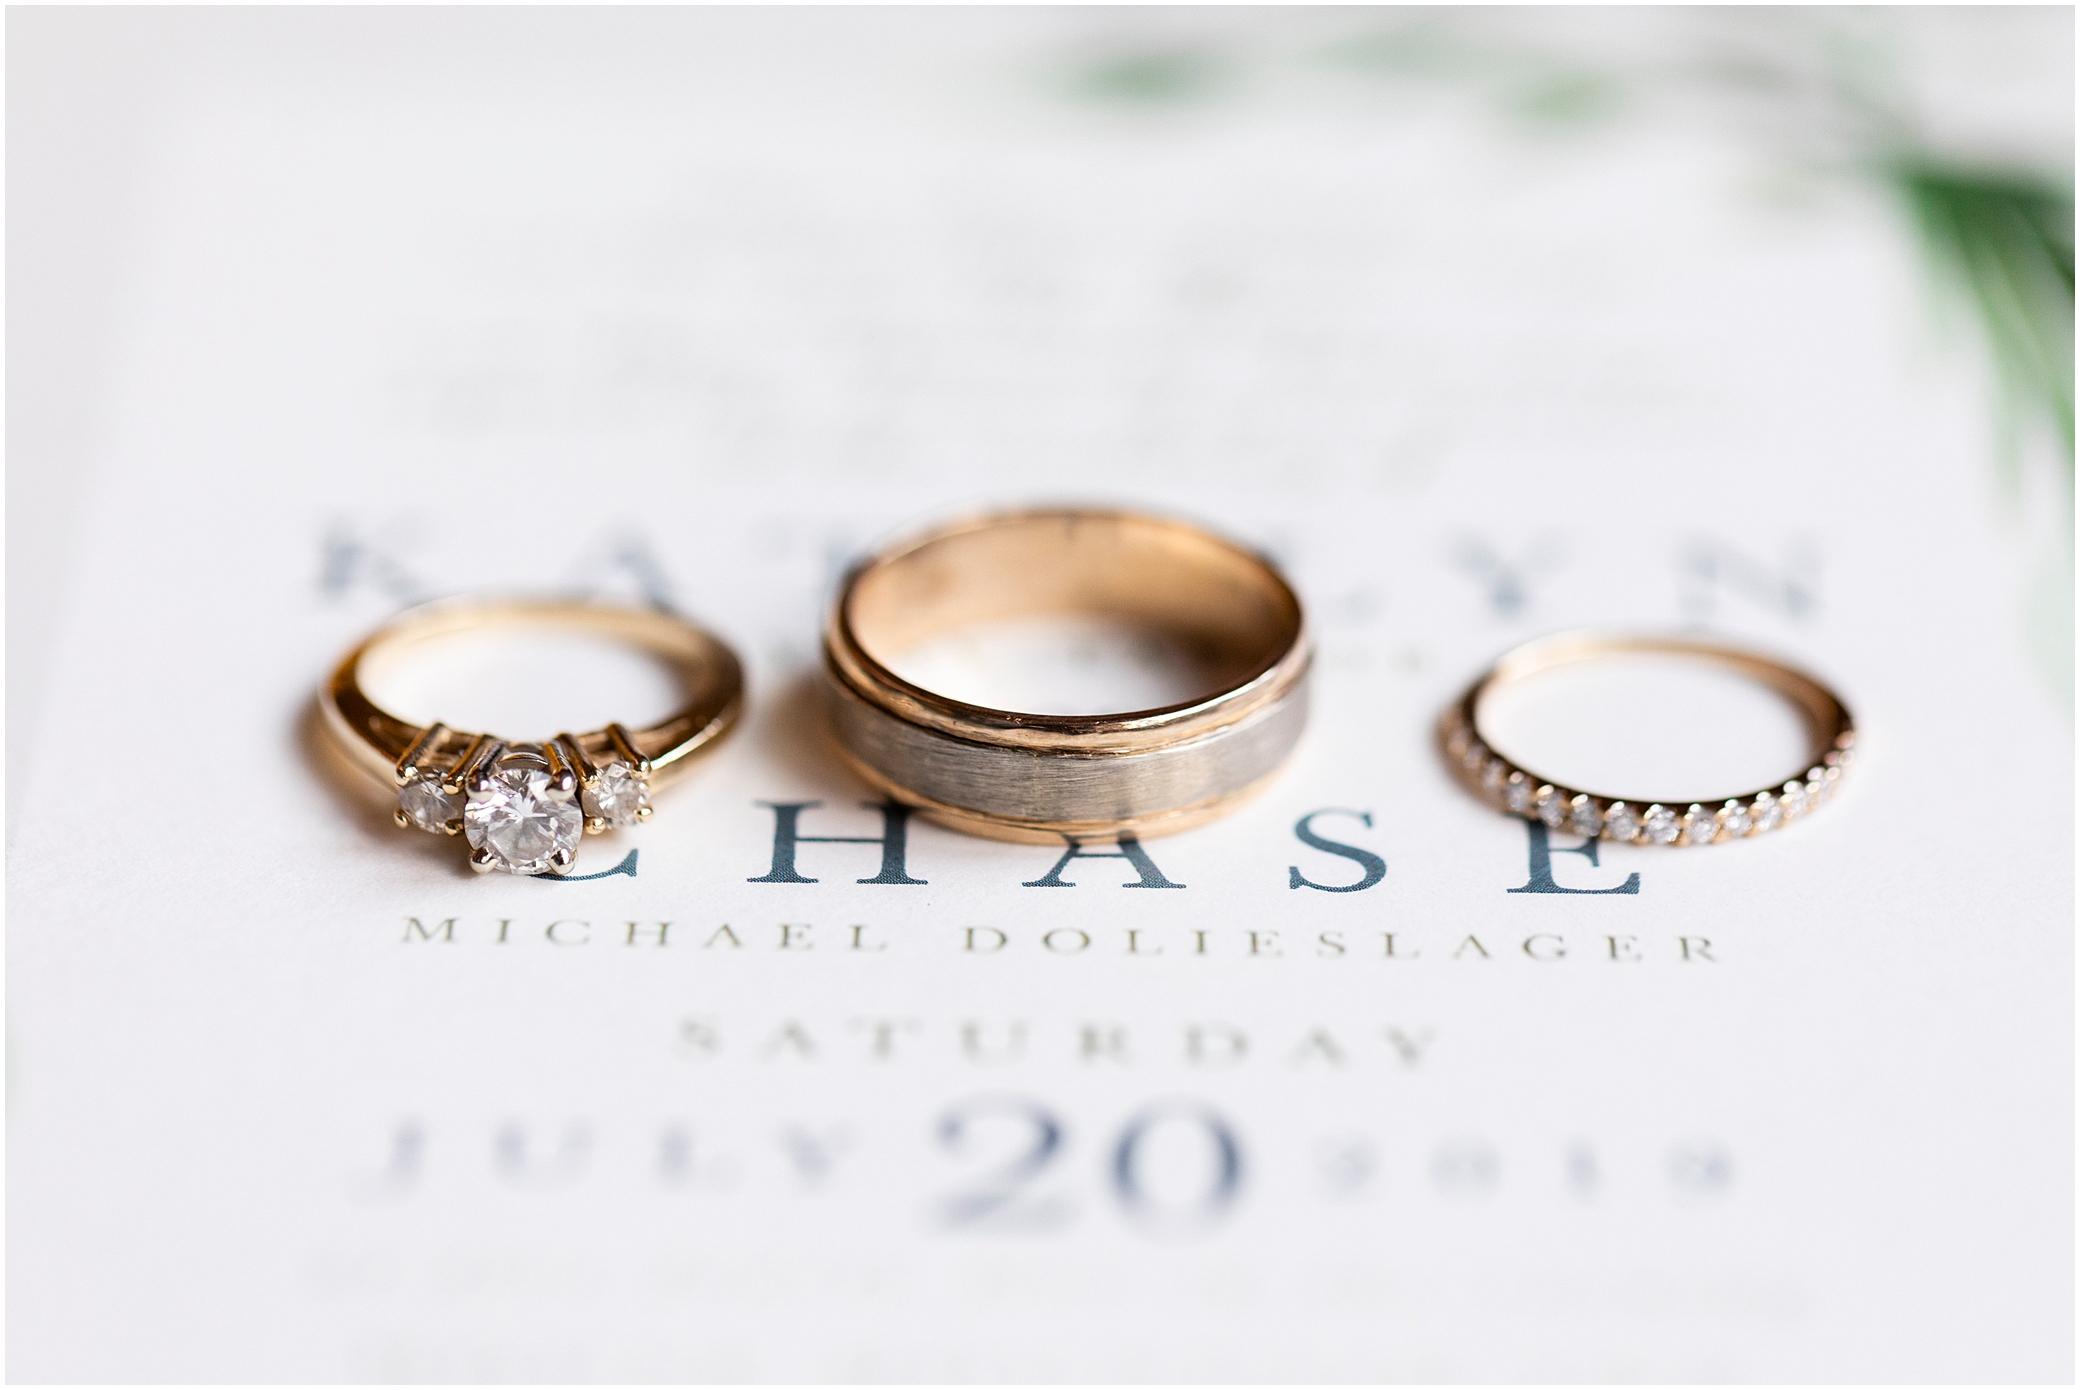 House Mountain Inn Wedding, Virginia wedding in the mountains, wedding rings